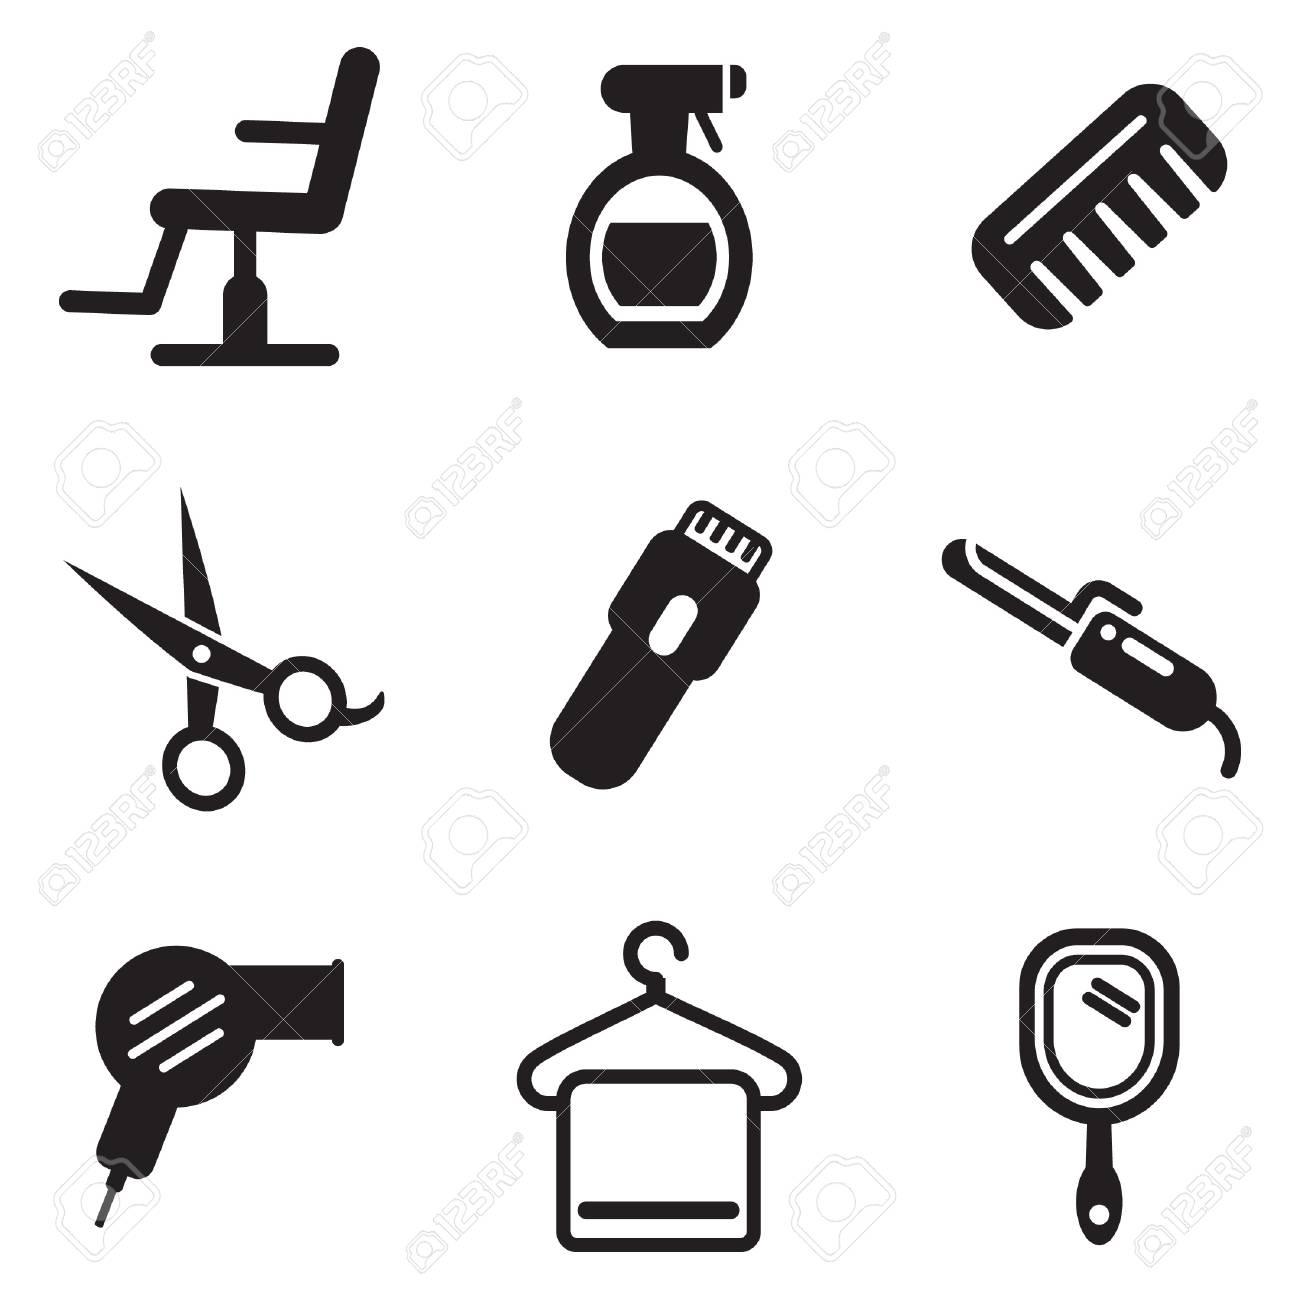 Hair Salon Icons Royalty Free Cliparts Vectors And Stock